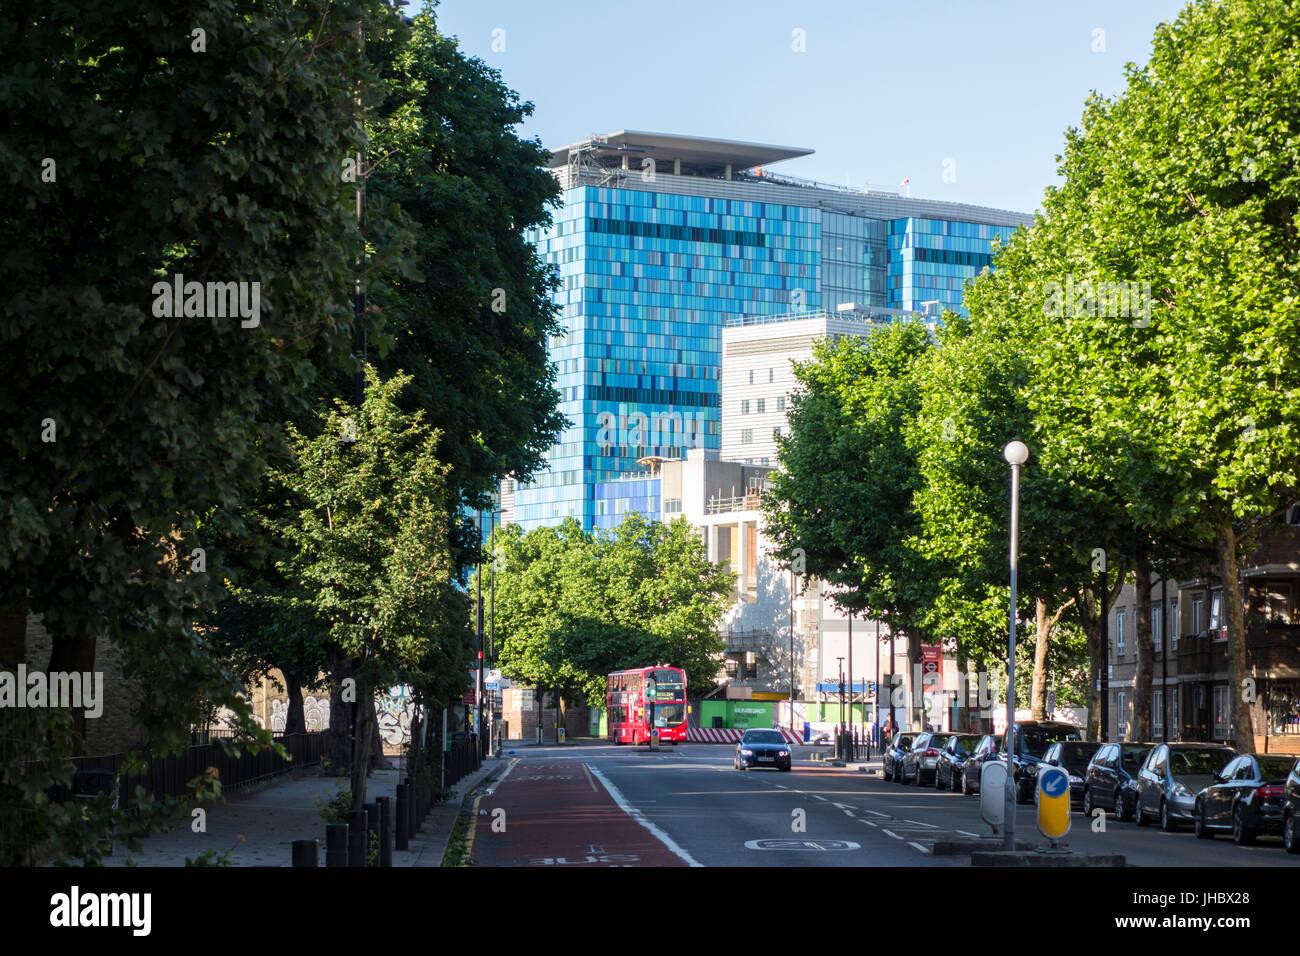 View of The Royal London Hospital along A107 Cambridge Heath Road, Bethnal Green, East London, UK - Stock Image